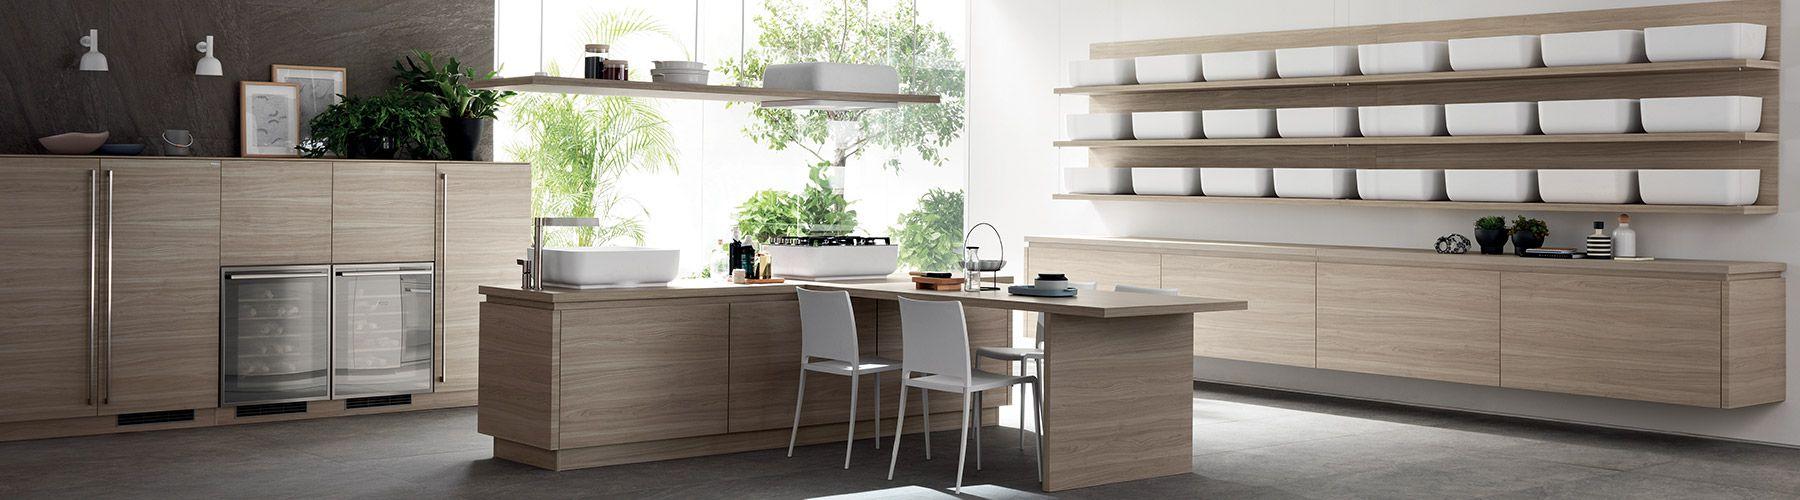 Italian Kitchen Cabinets Scavolini USA Official